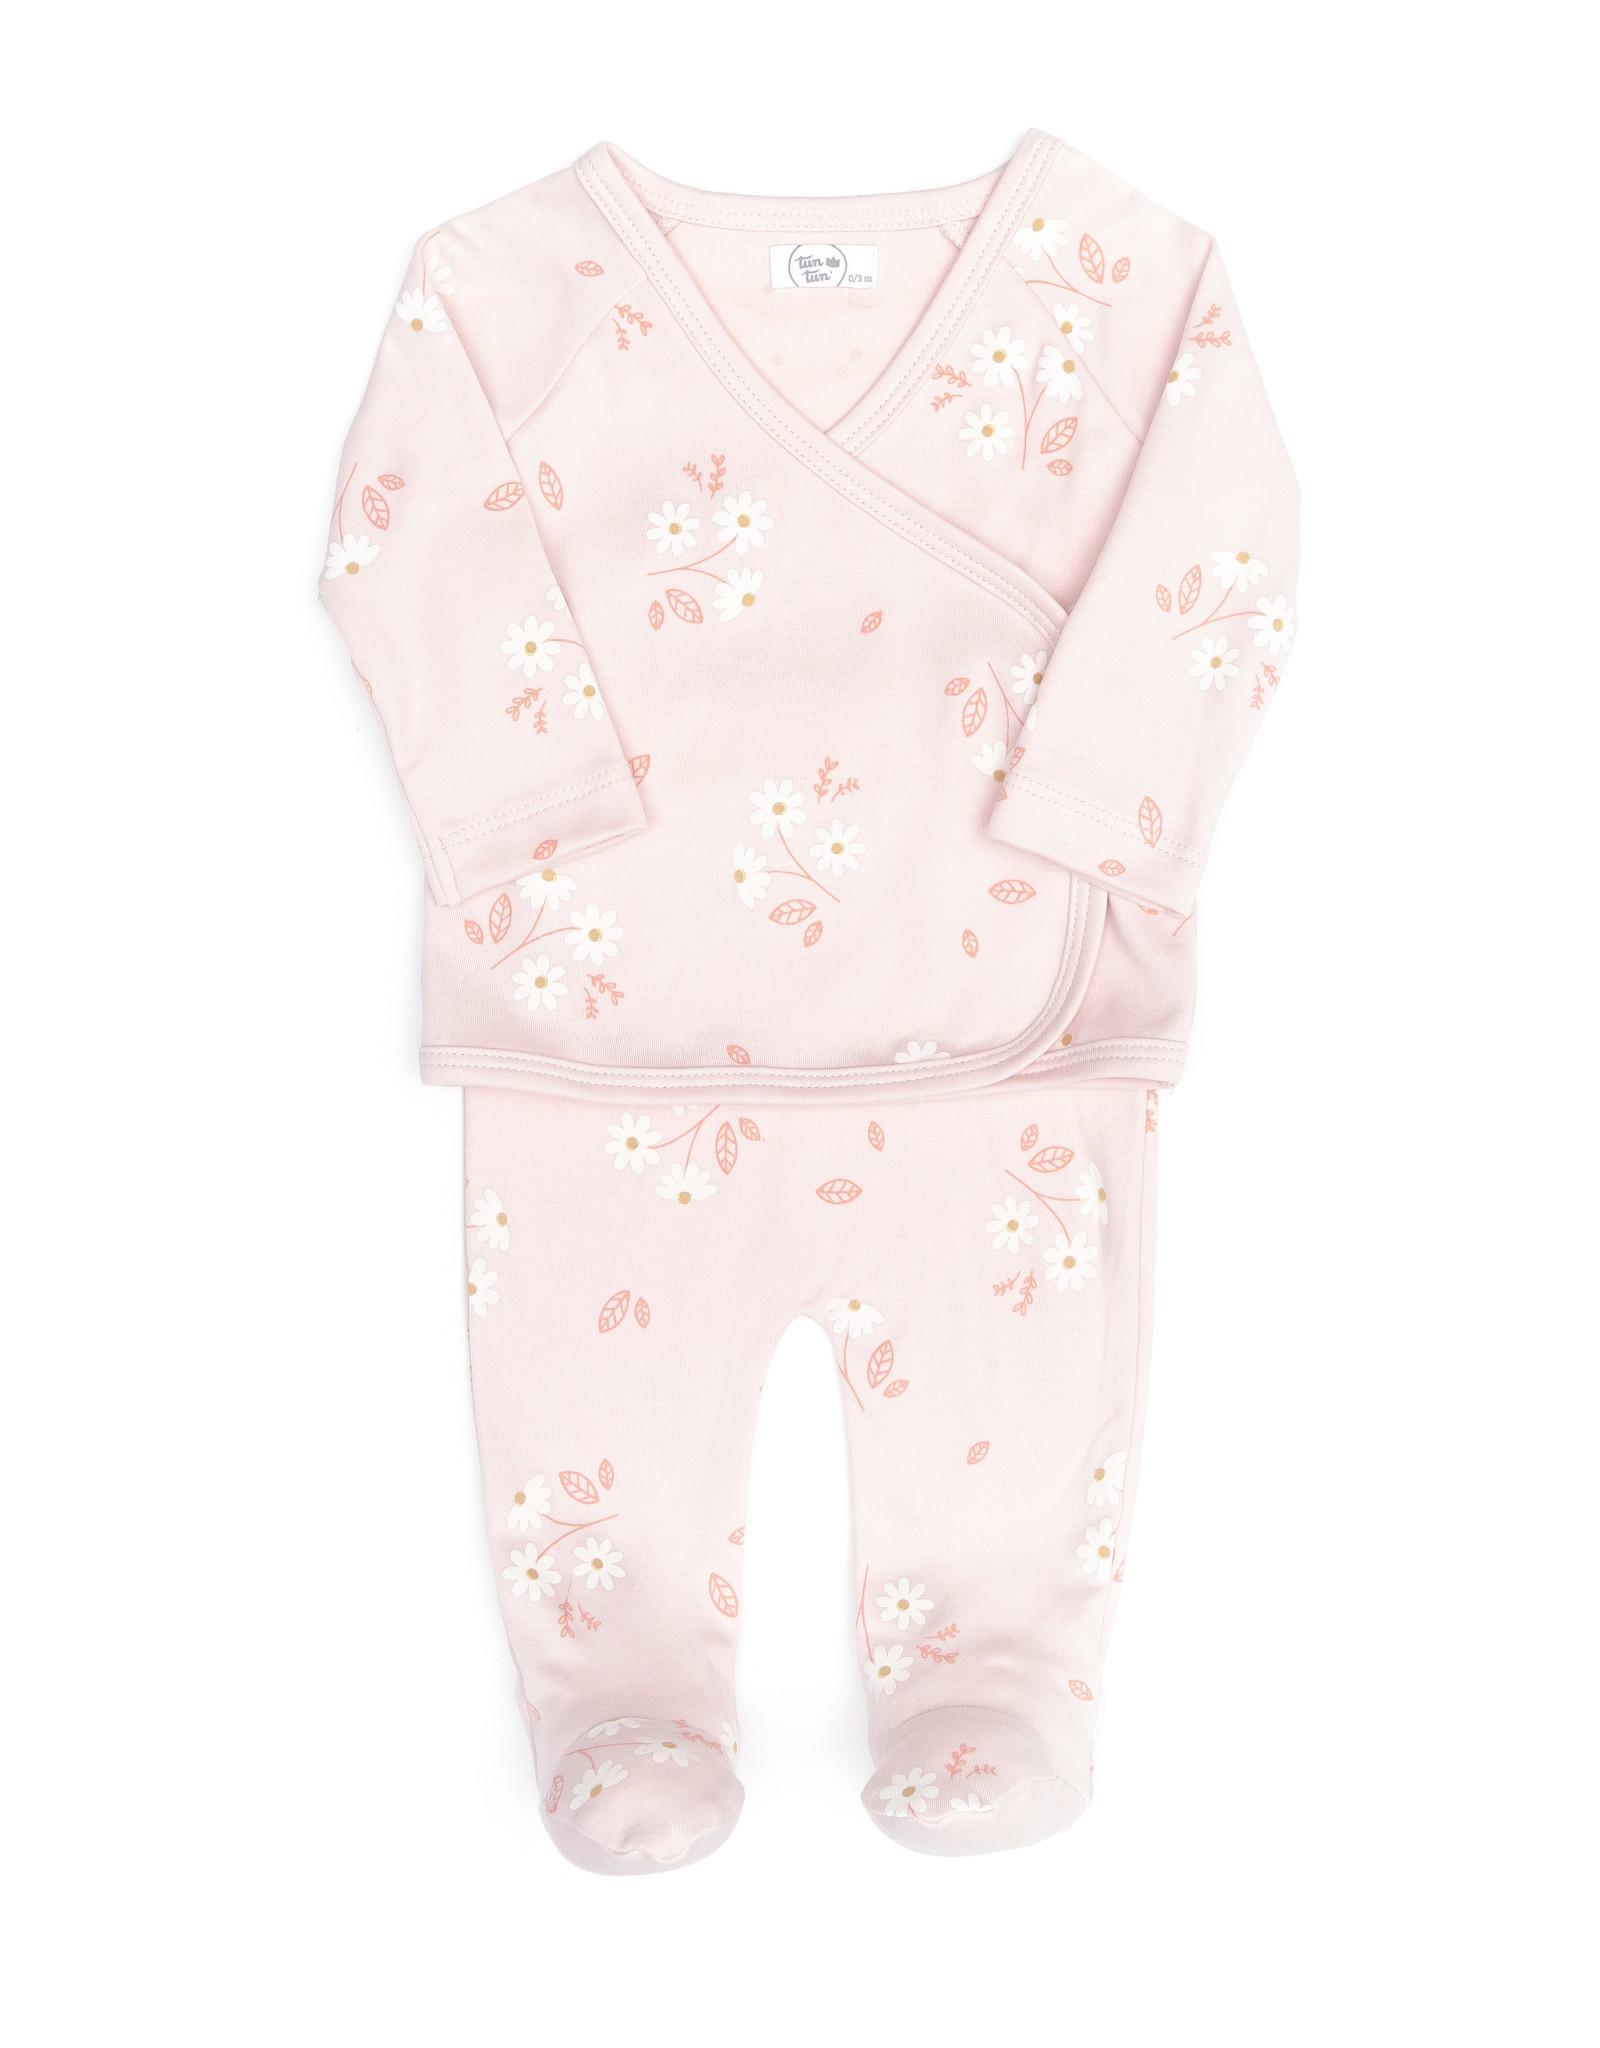 Tun Tun Tun Tun Kimono Set, Pink Daisies